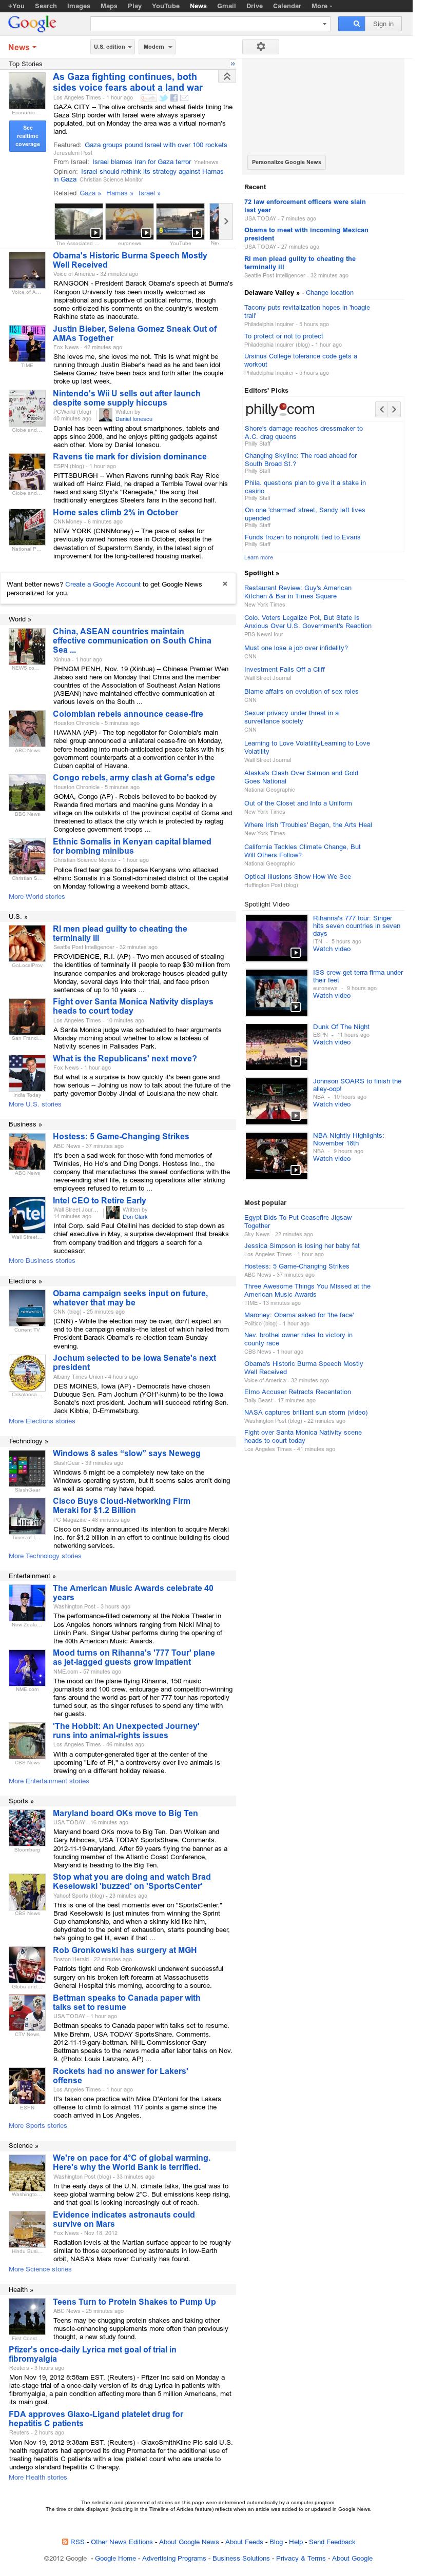 Google News at Monday Nov. 19, 2012, 5:11 p.m. UTC